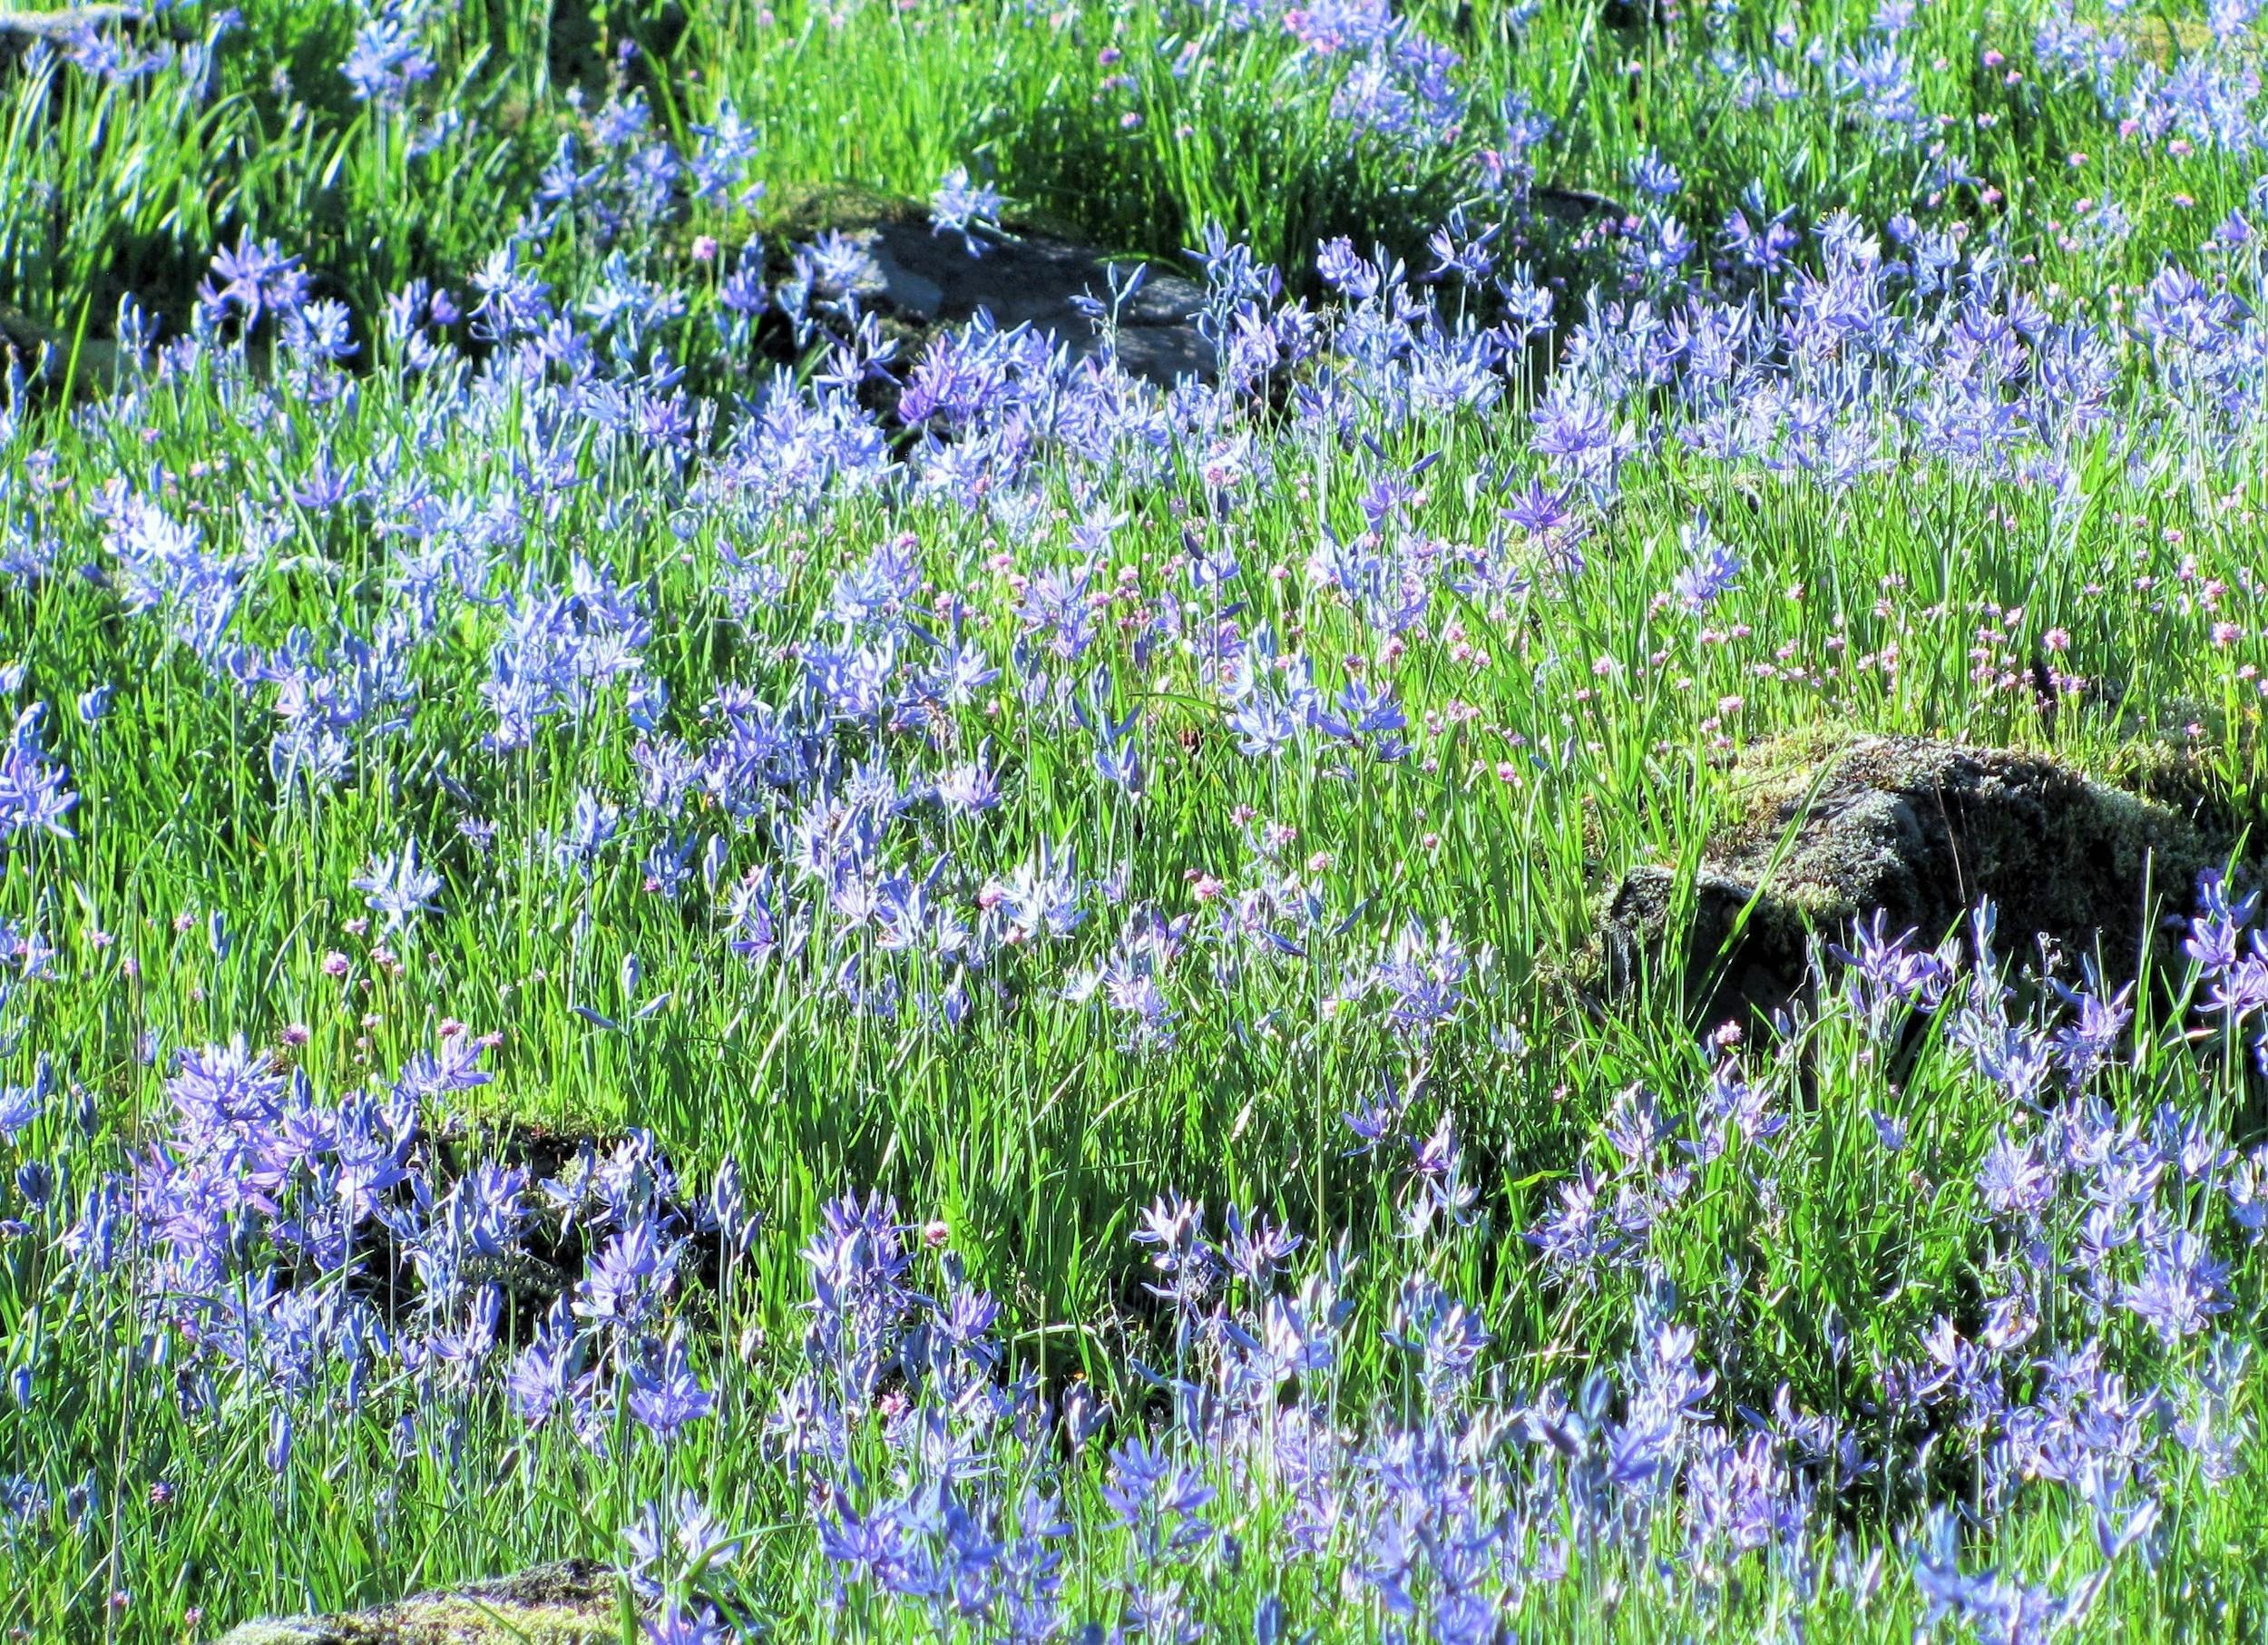 Camas Lilies on Wander Nature